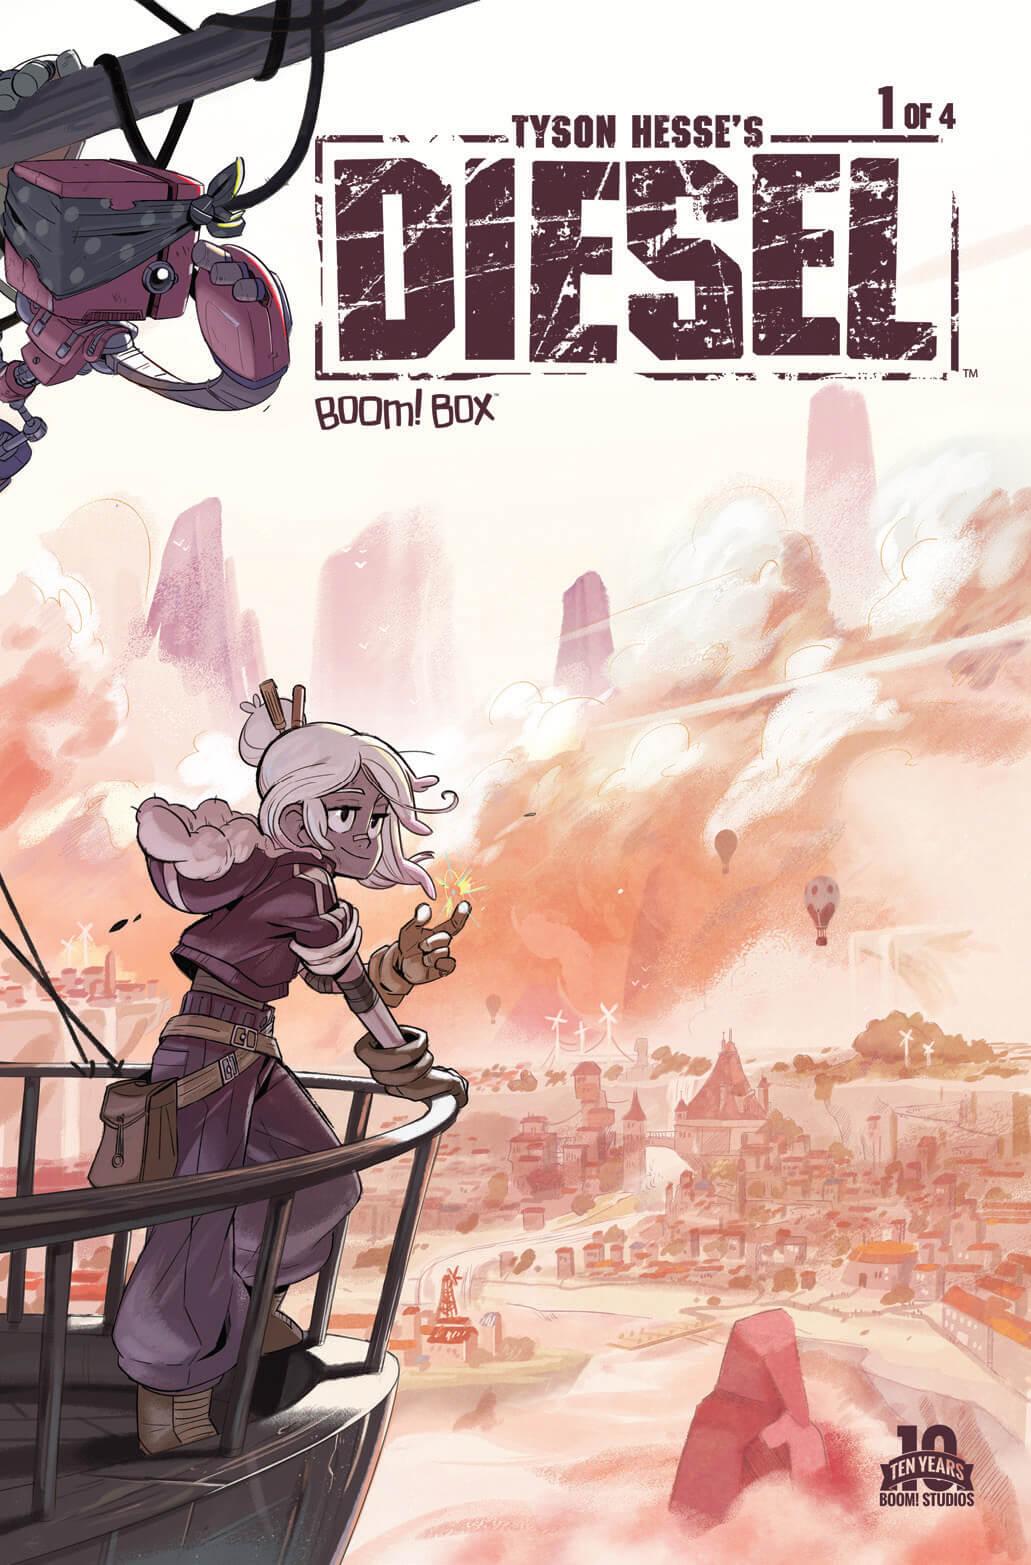 Tyson Hesse: Diesel #1